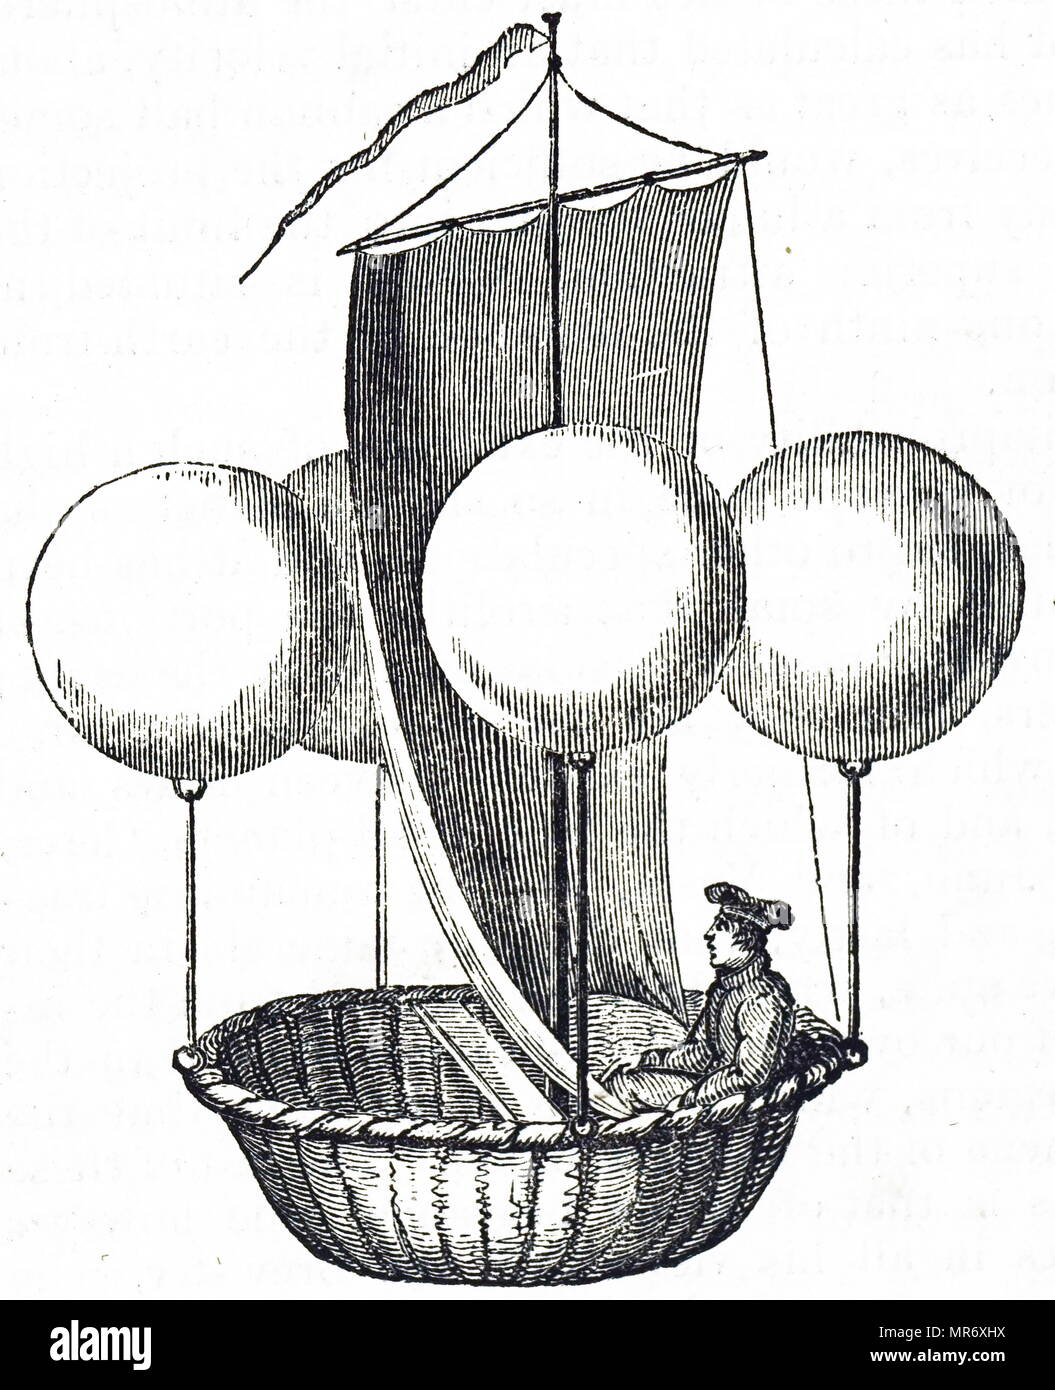 Gravur, Francesco Lana de Terzi's Flying boot Konzept. Francesco Lana de Terzi (1631-1687) ein italienischer Jesuit, Mathematiker, Naturwissenschaftler und Luftfahrt Pionier. Vom 19. Jahrhundert Stockbild